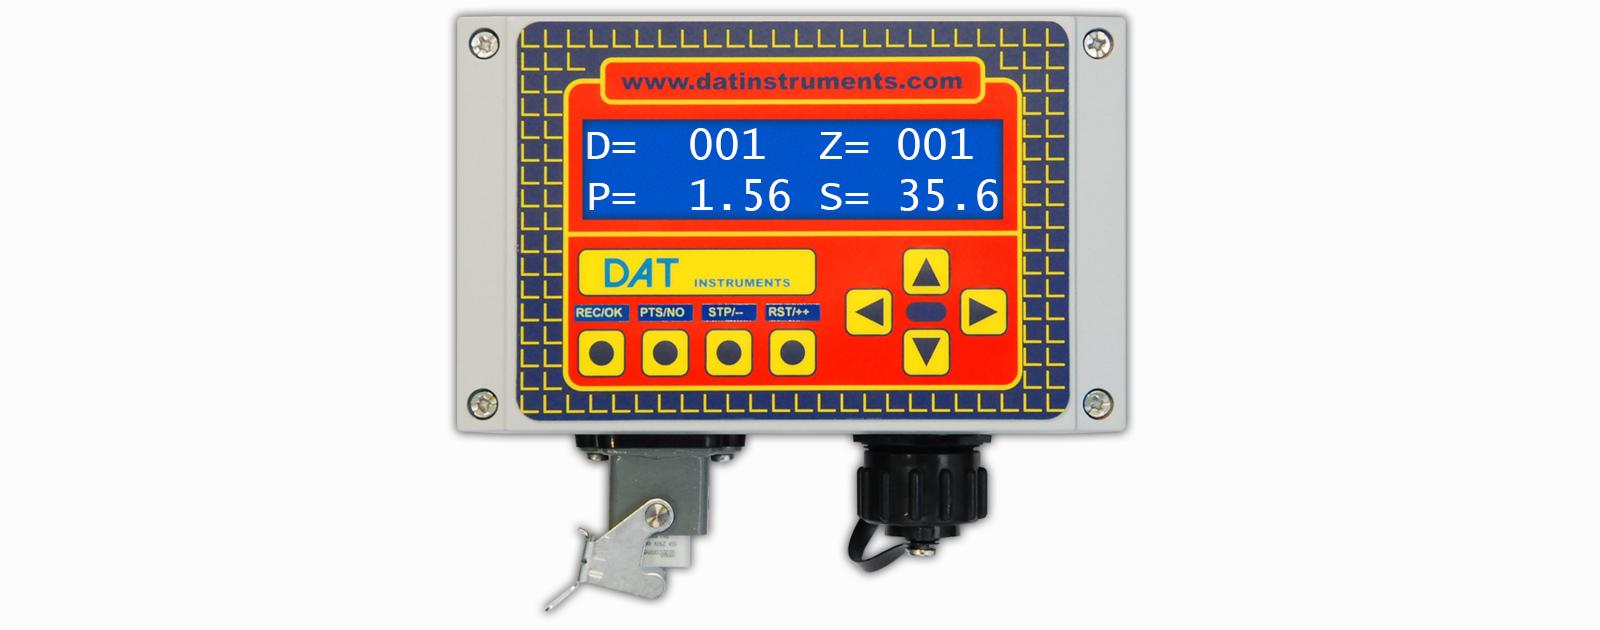 DAT instruments, JET SDP IB, datalogger, instrumentation, MWD drilling parameters recorder, sensors, geotechnical digitalization